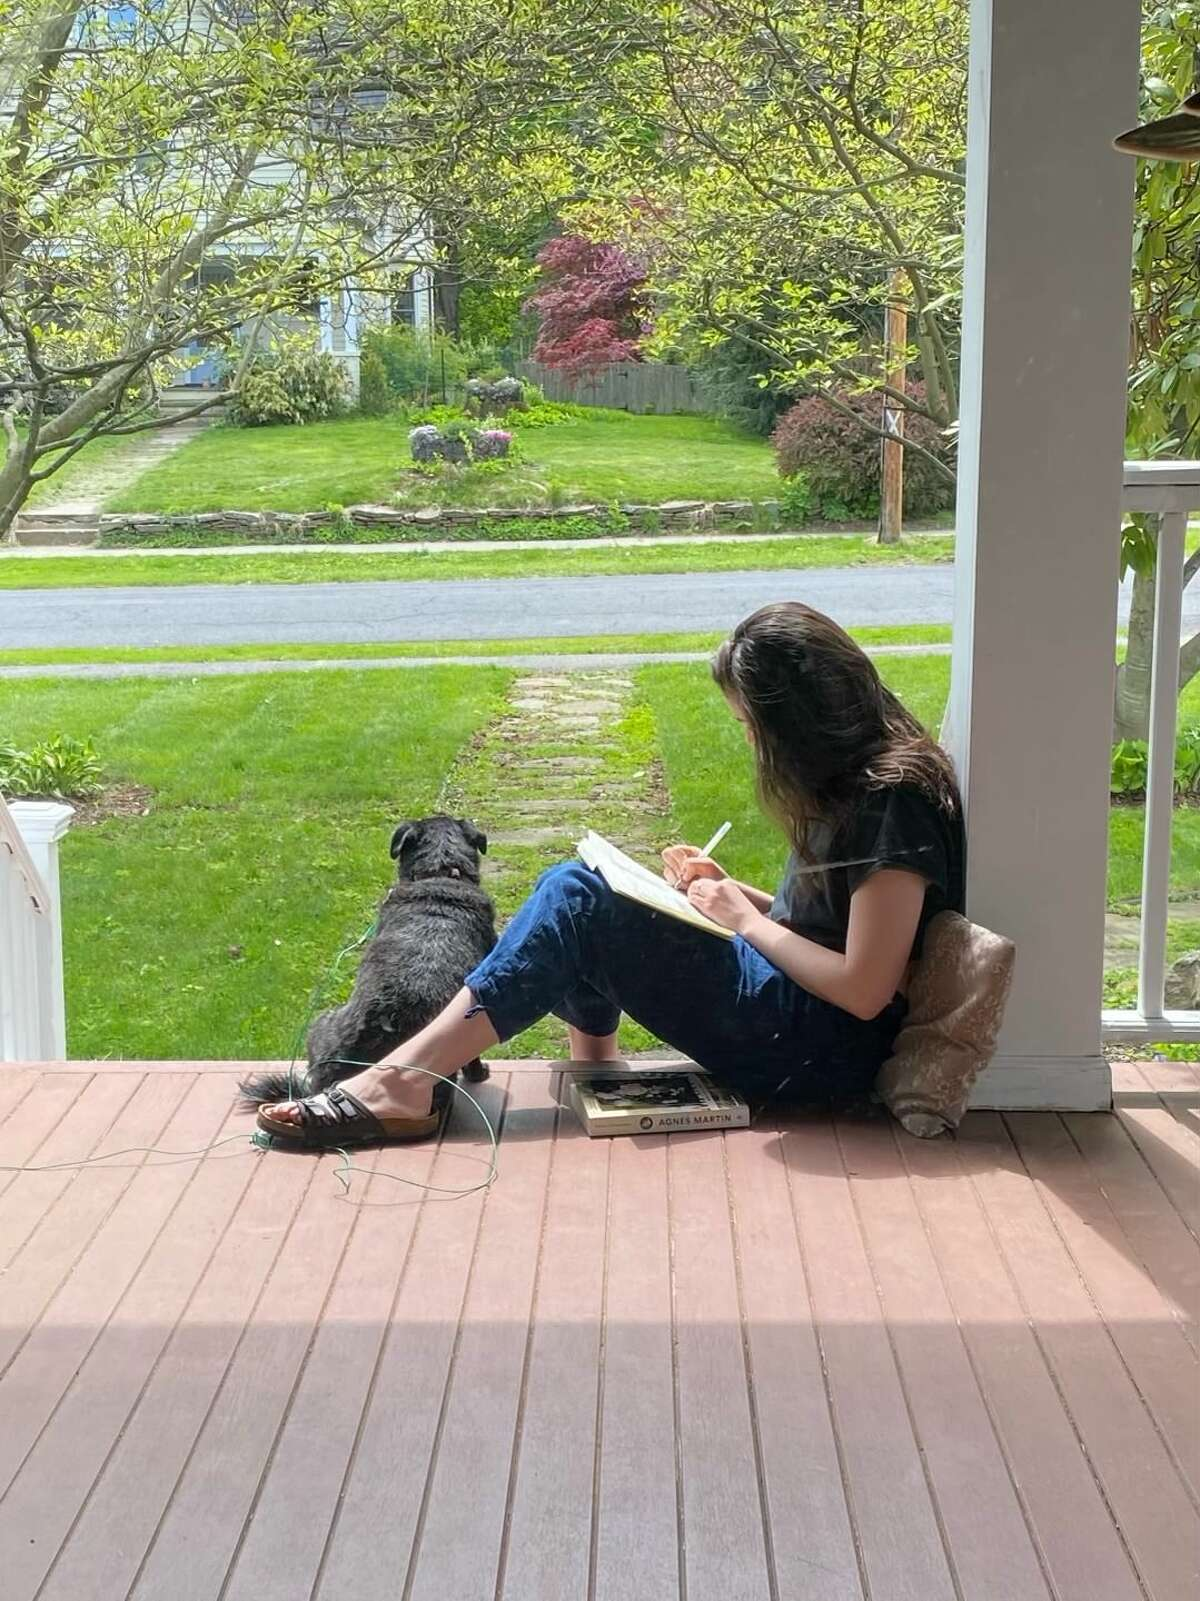 Two views of the porch on Donna Liquori and Mark McGuire's Delmar home.